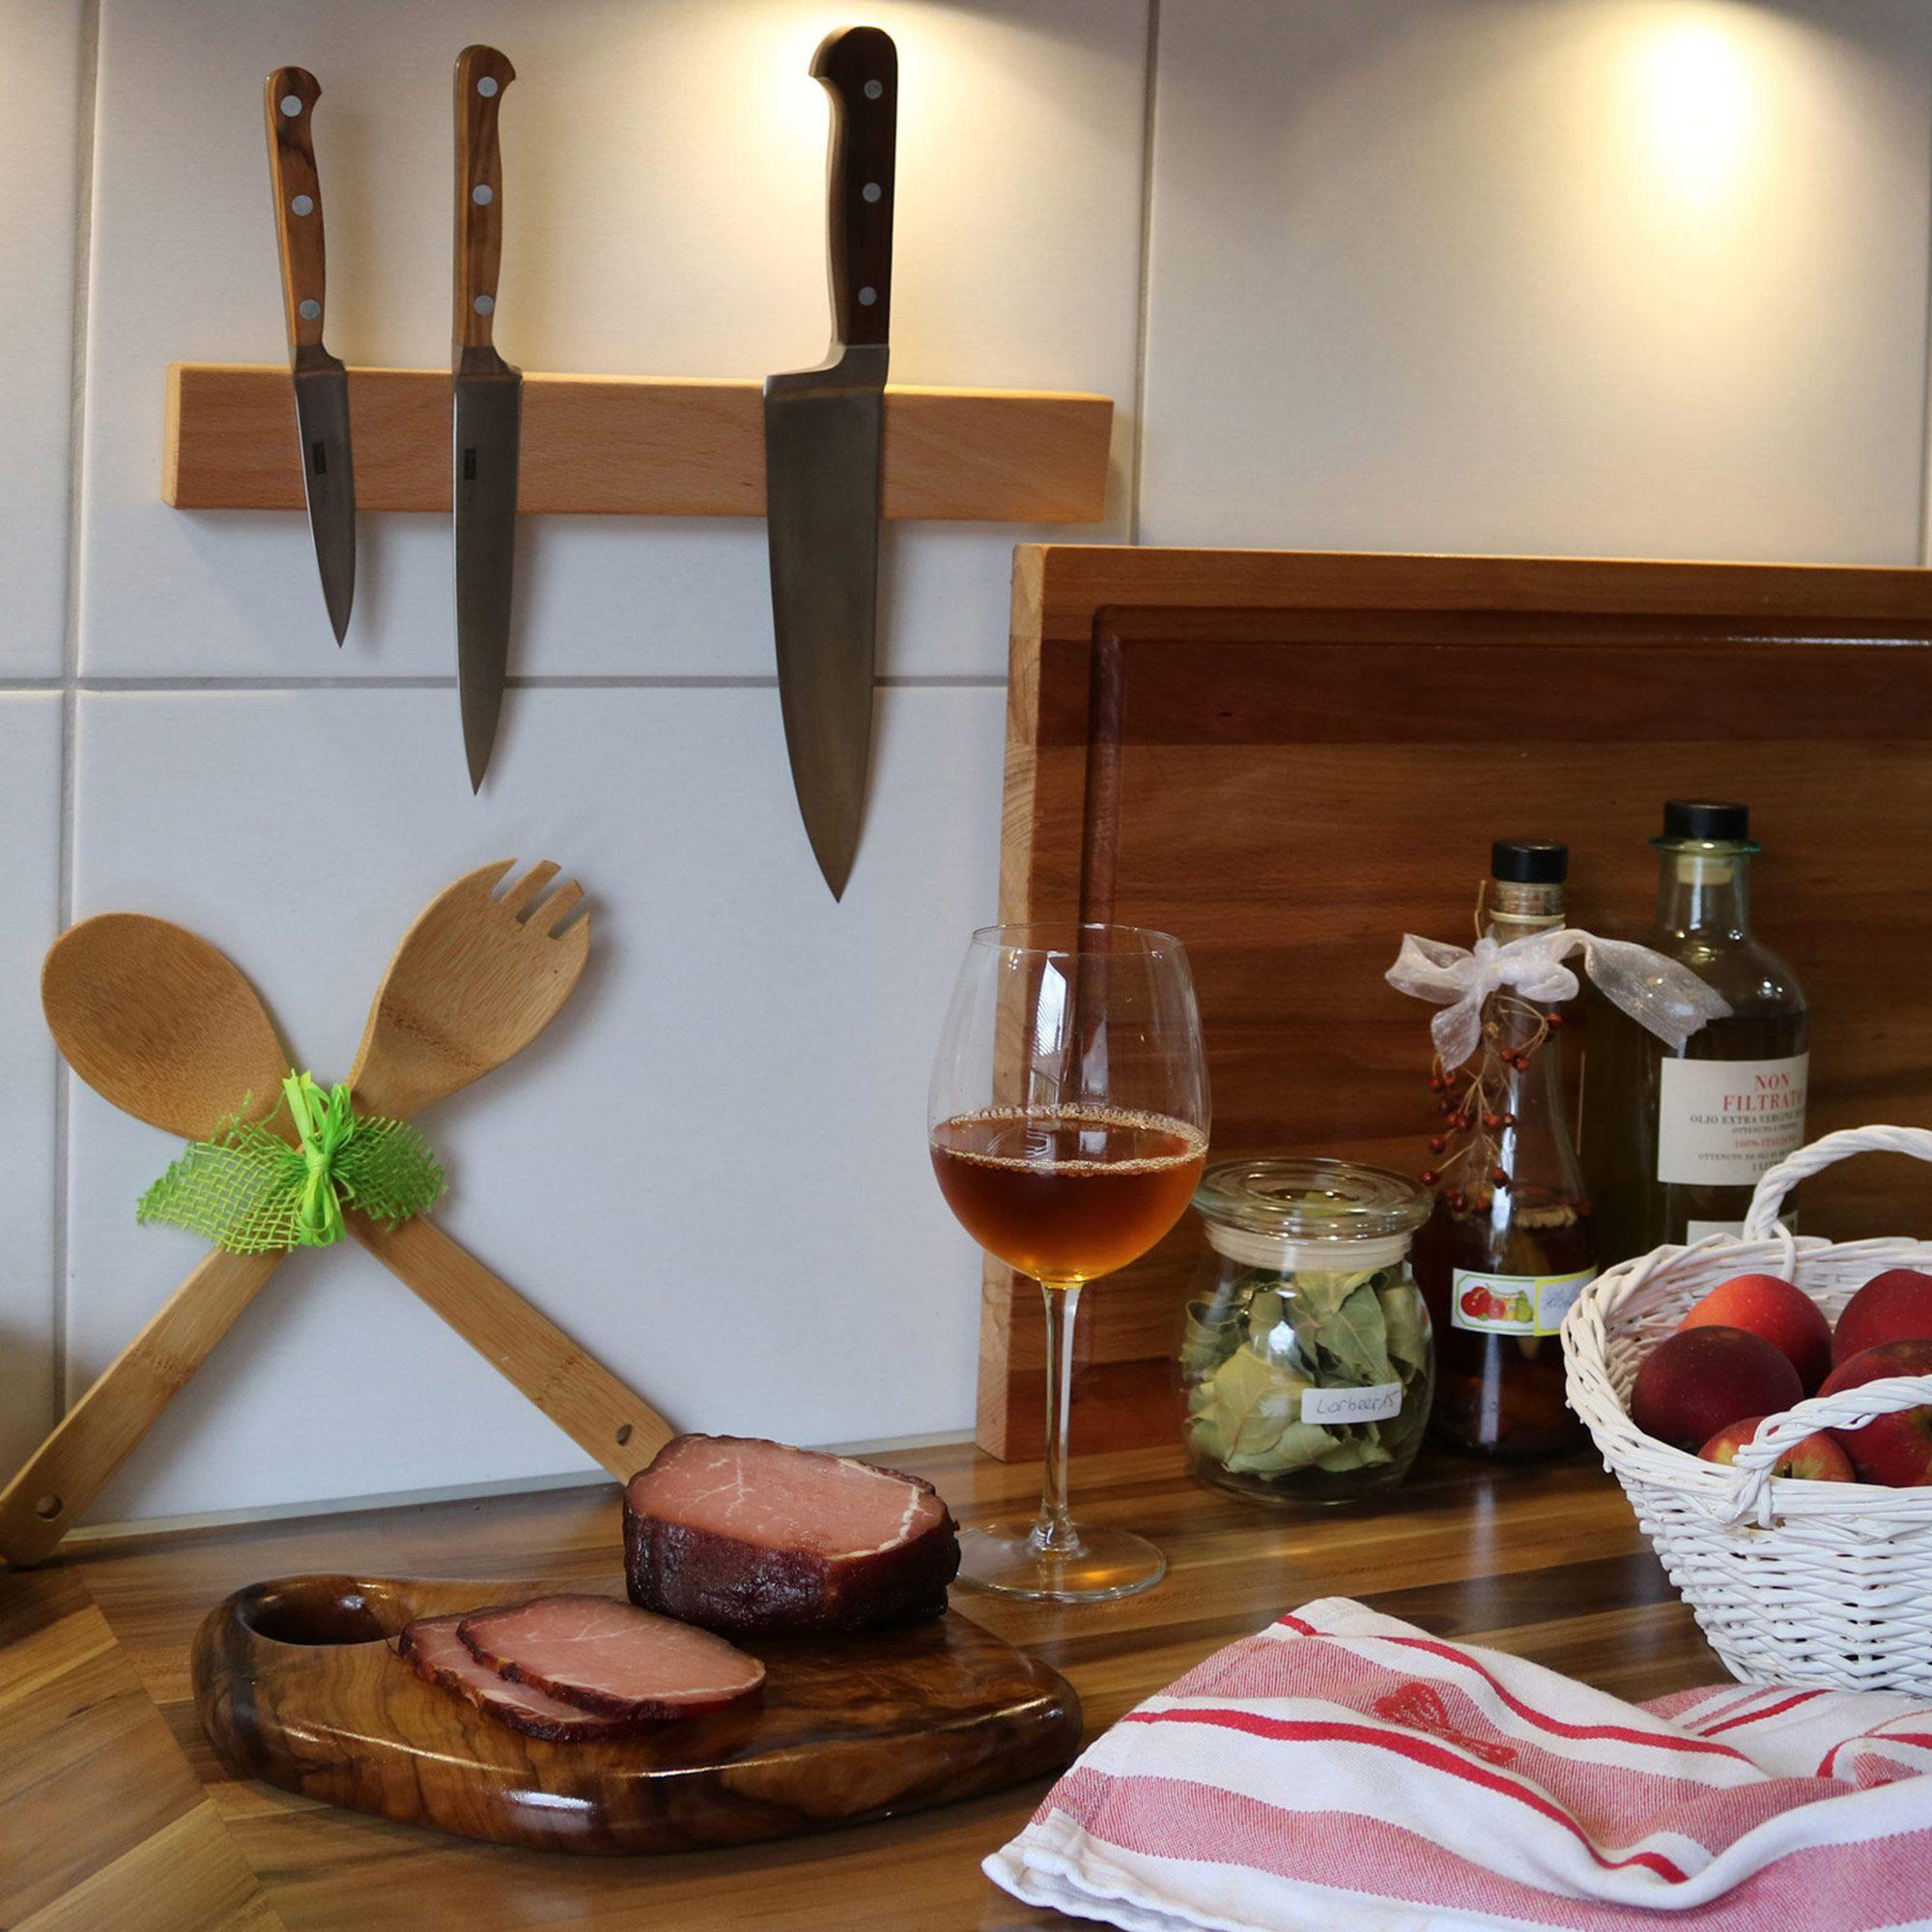 NATUREHOME Schlüsselbrett Magnetleiste für Messer Eichen-Holz geölt 350mm